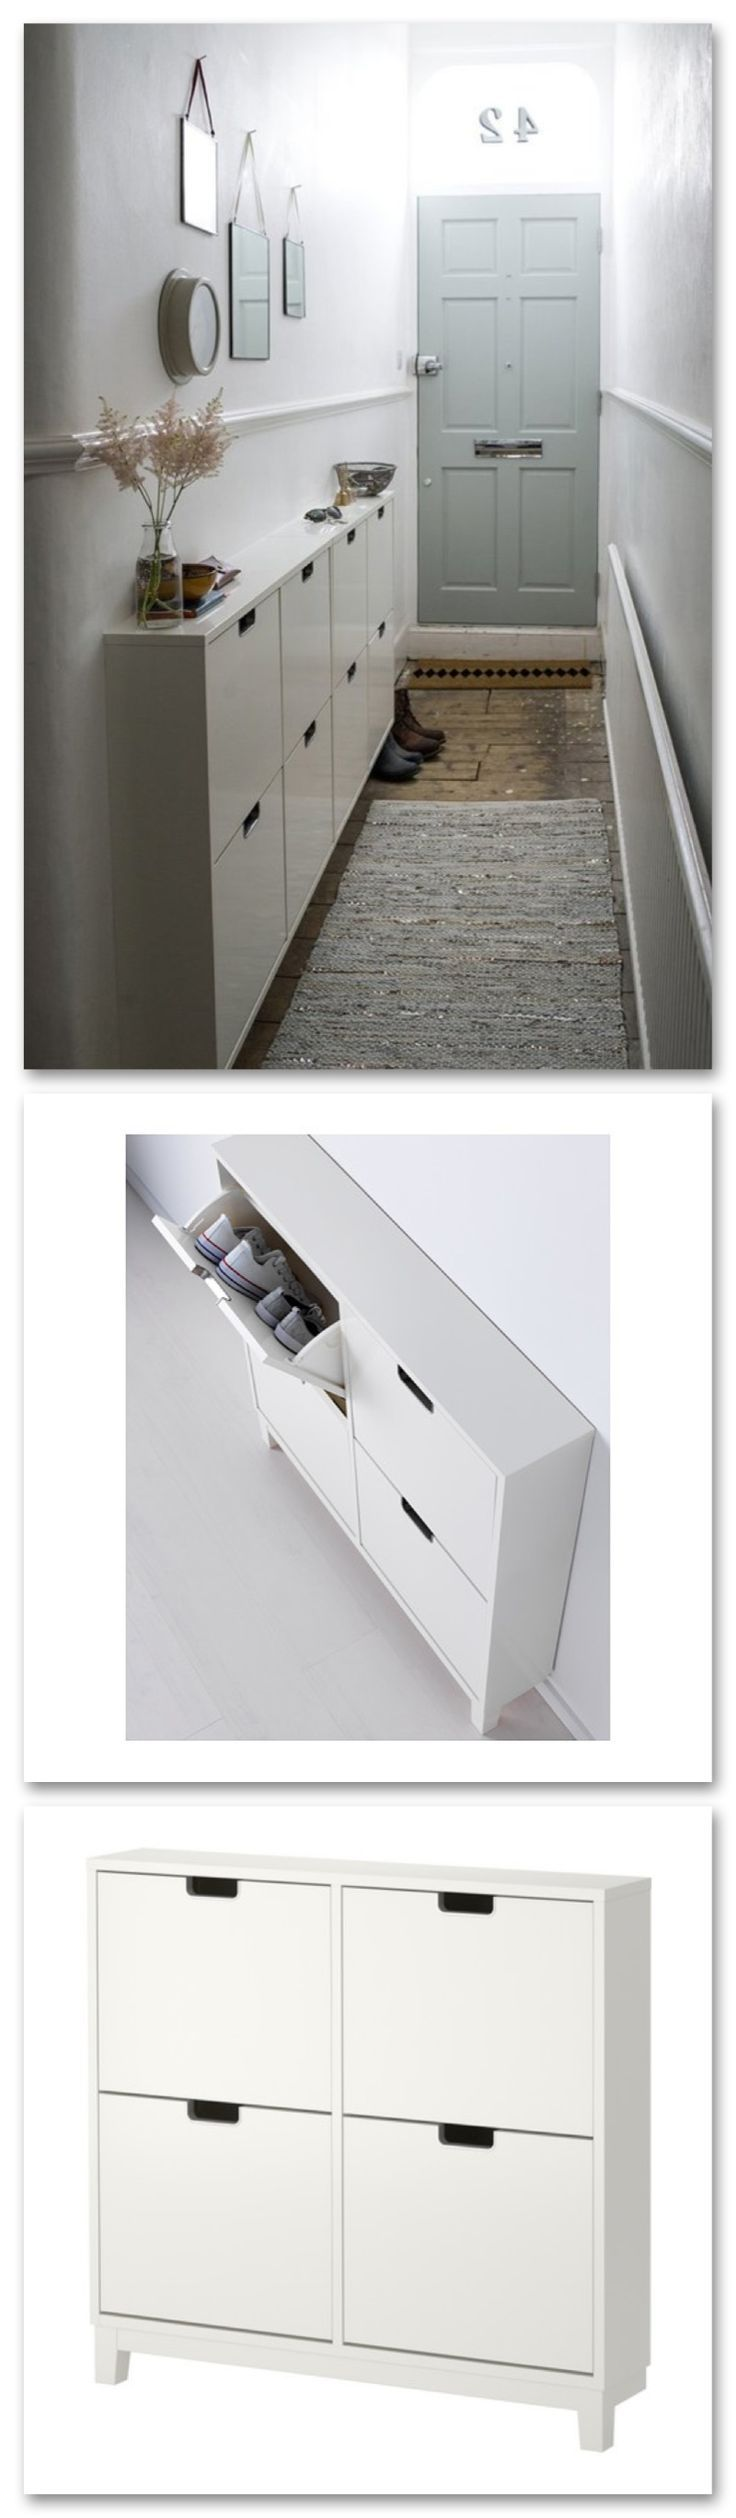 Hallway storage cabinet  STÄLL Shoe cabinet with  compartments blackbrown  Hall Storage